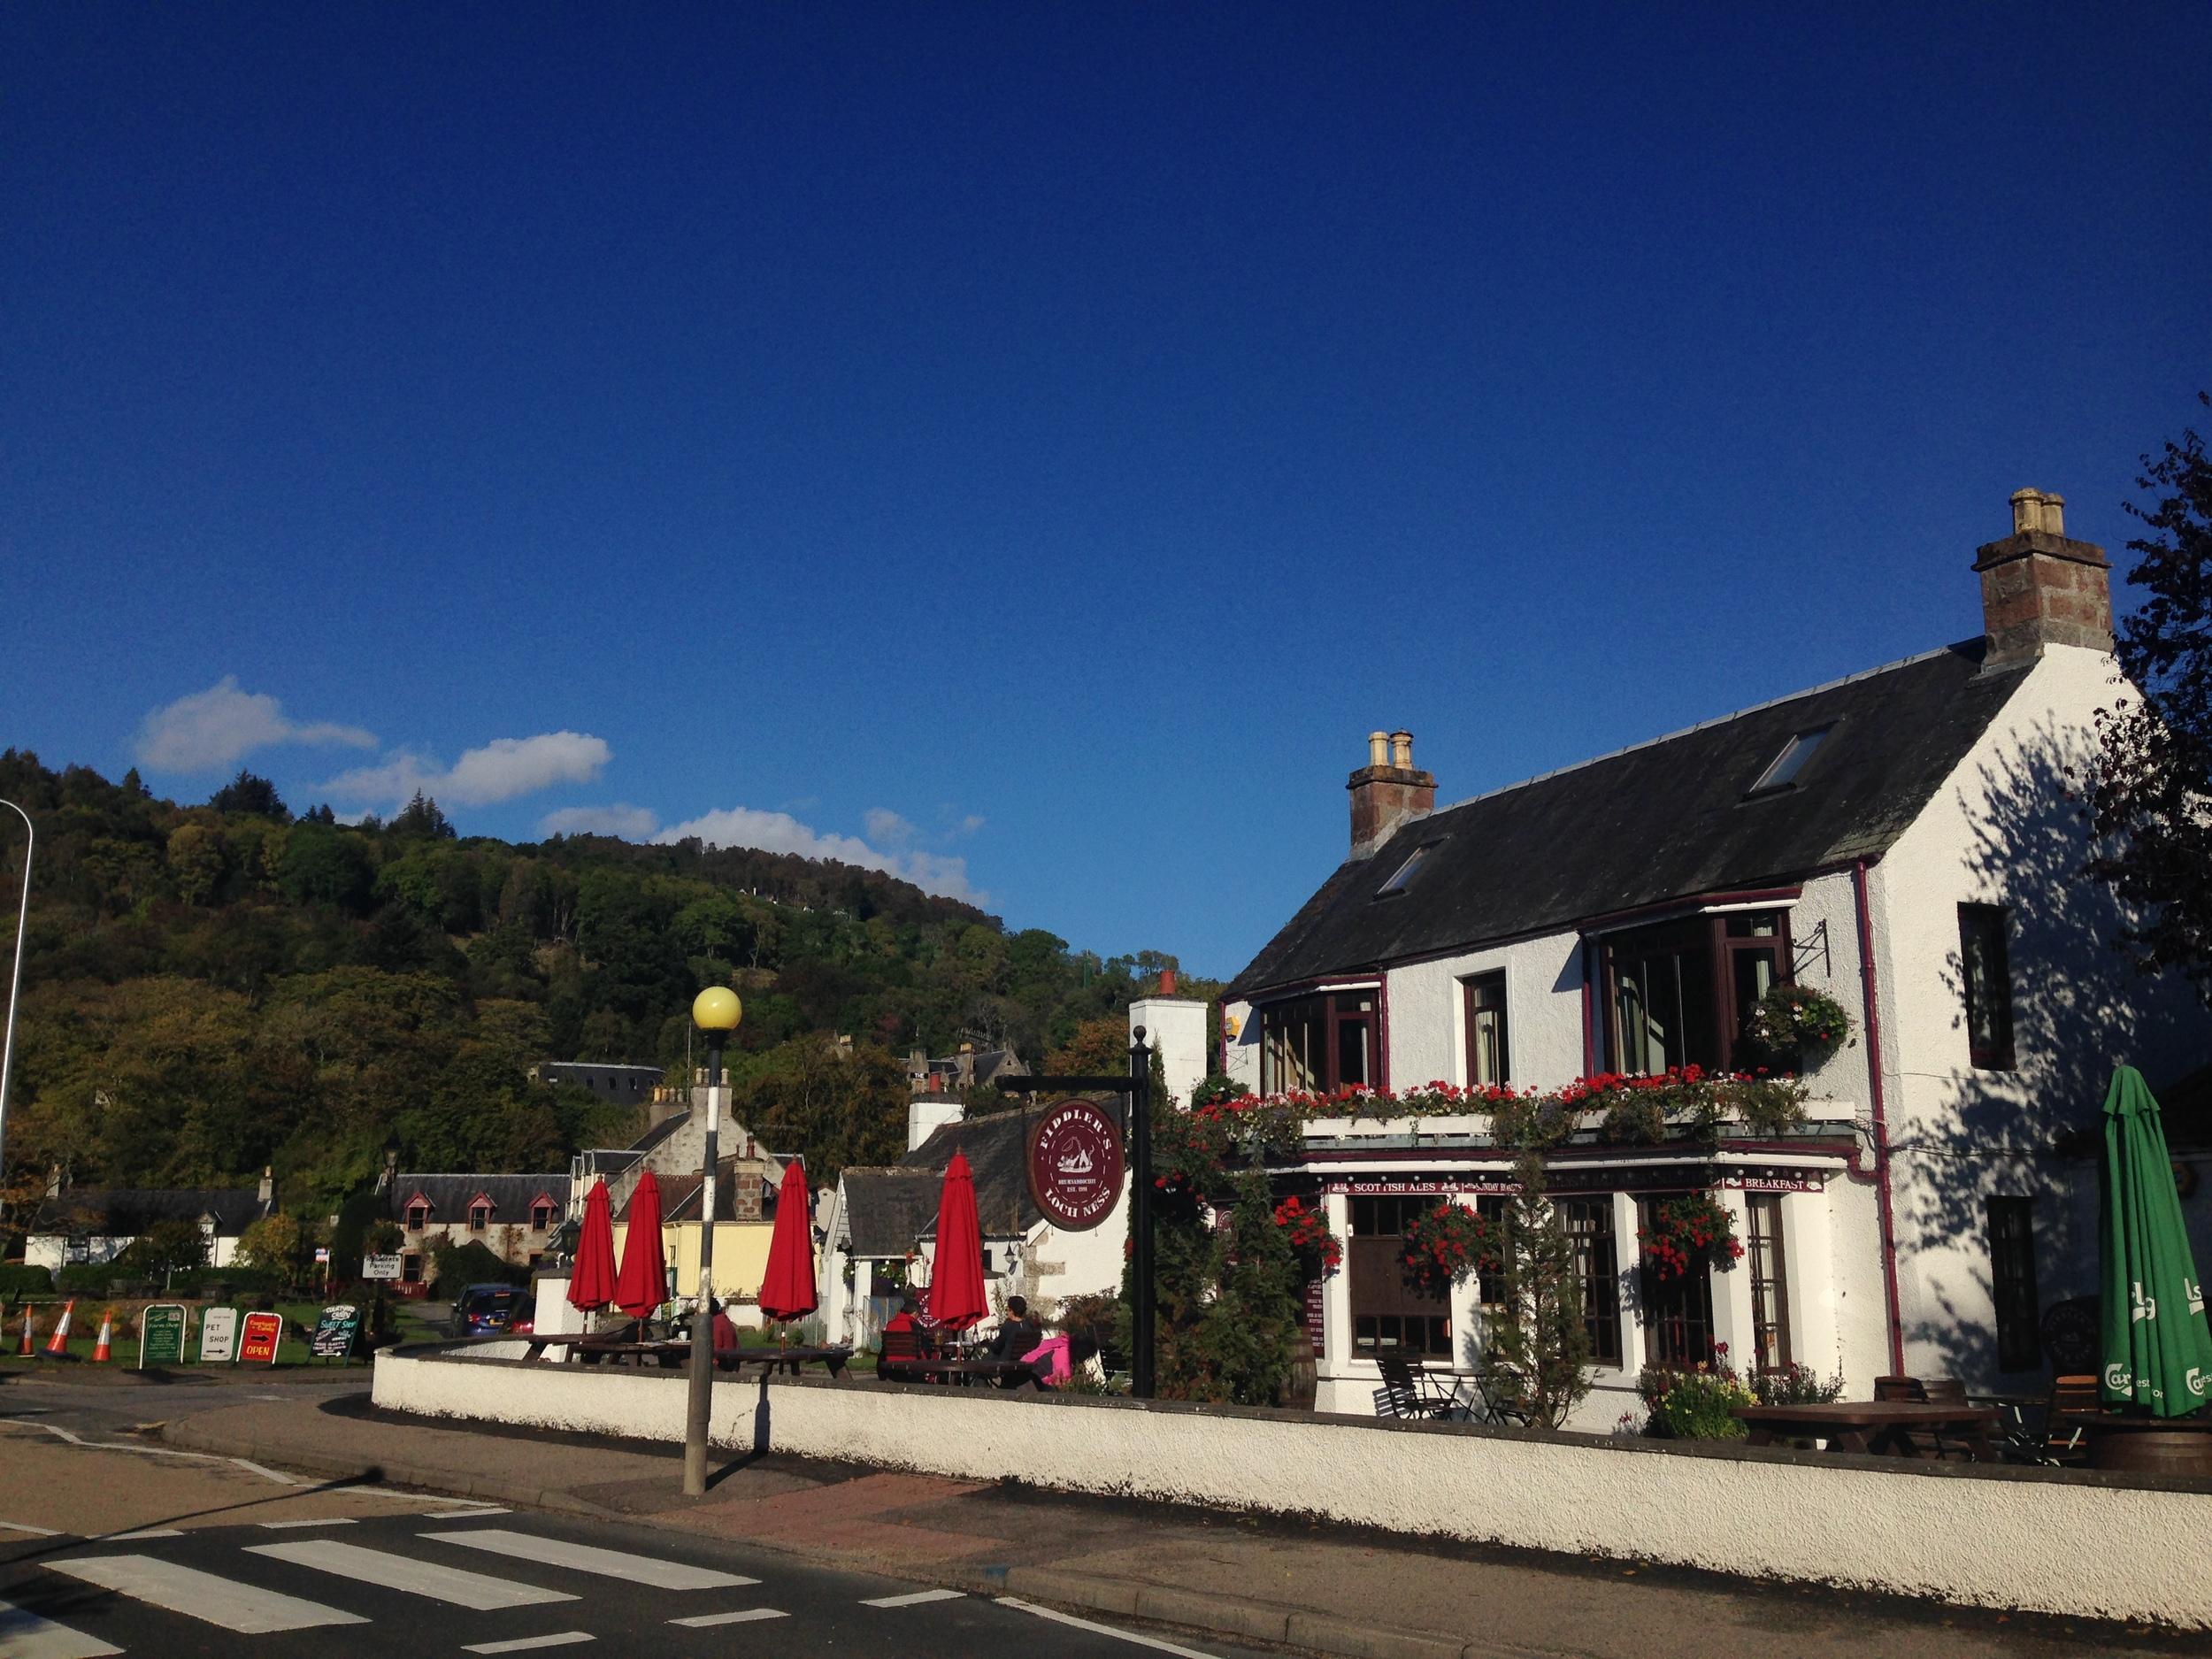 fiddlers inn, scotland